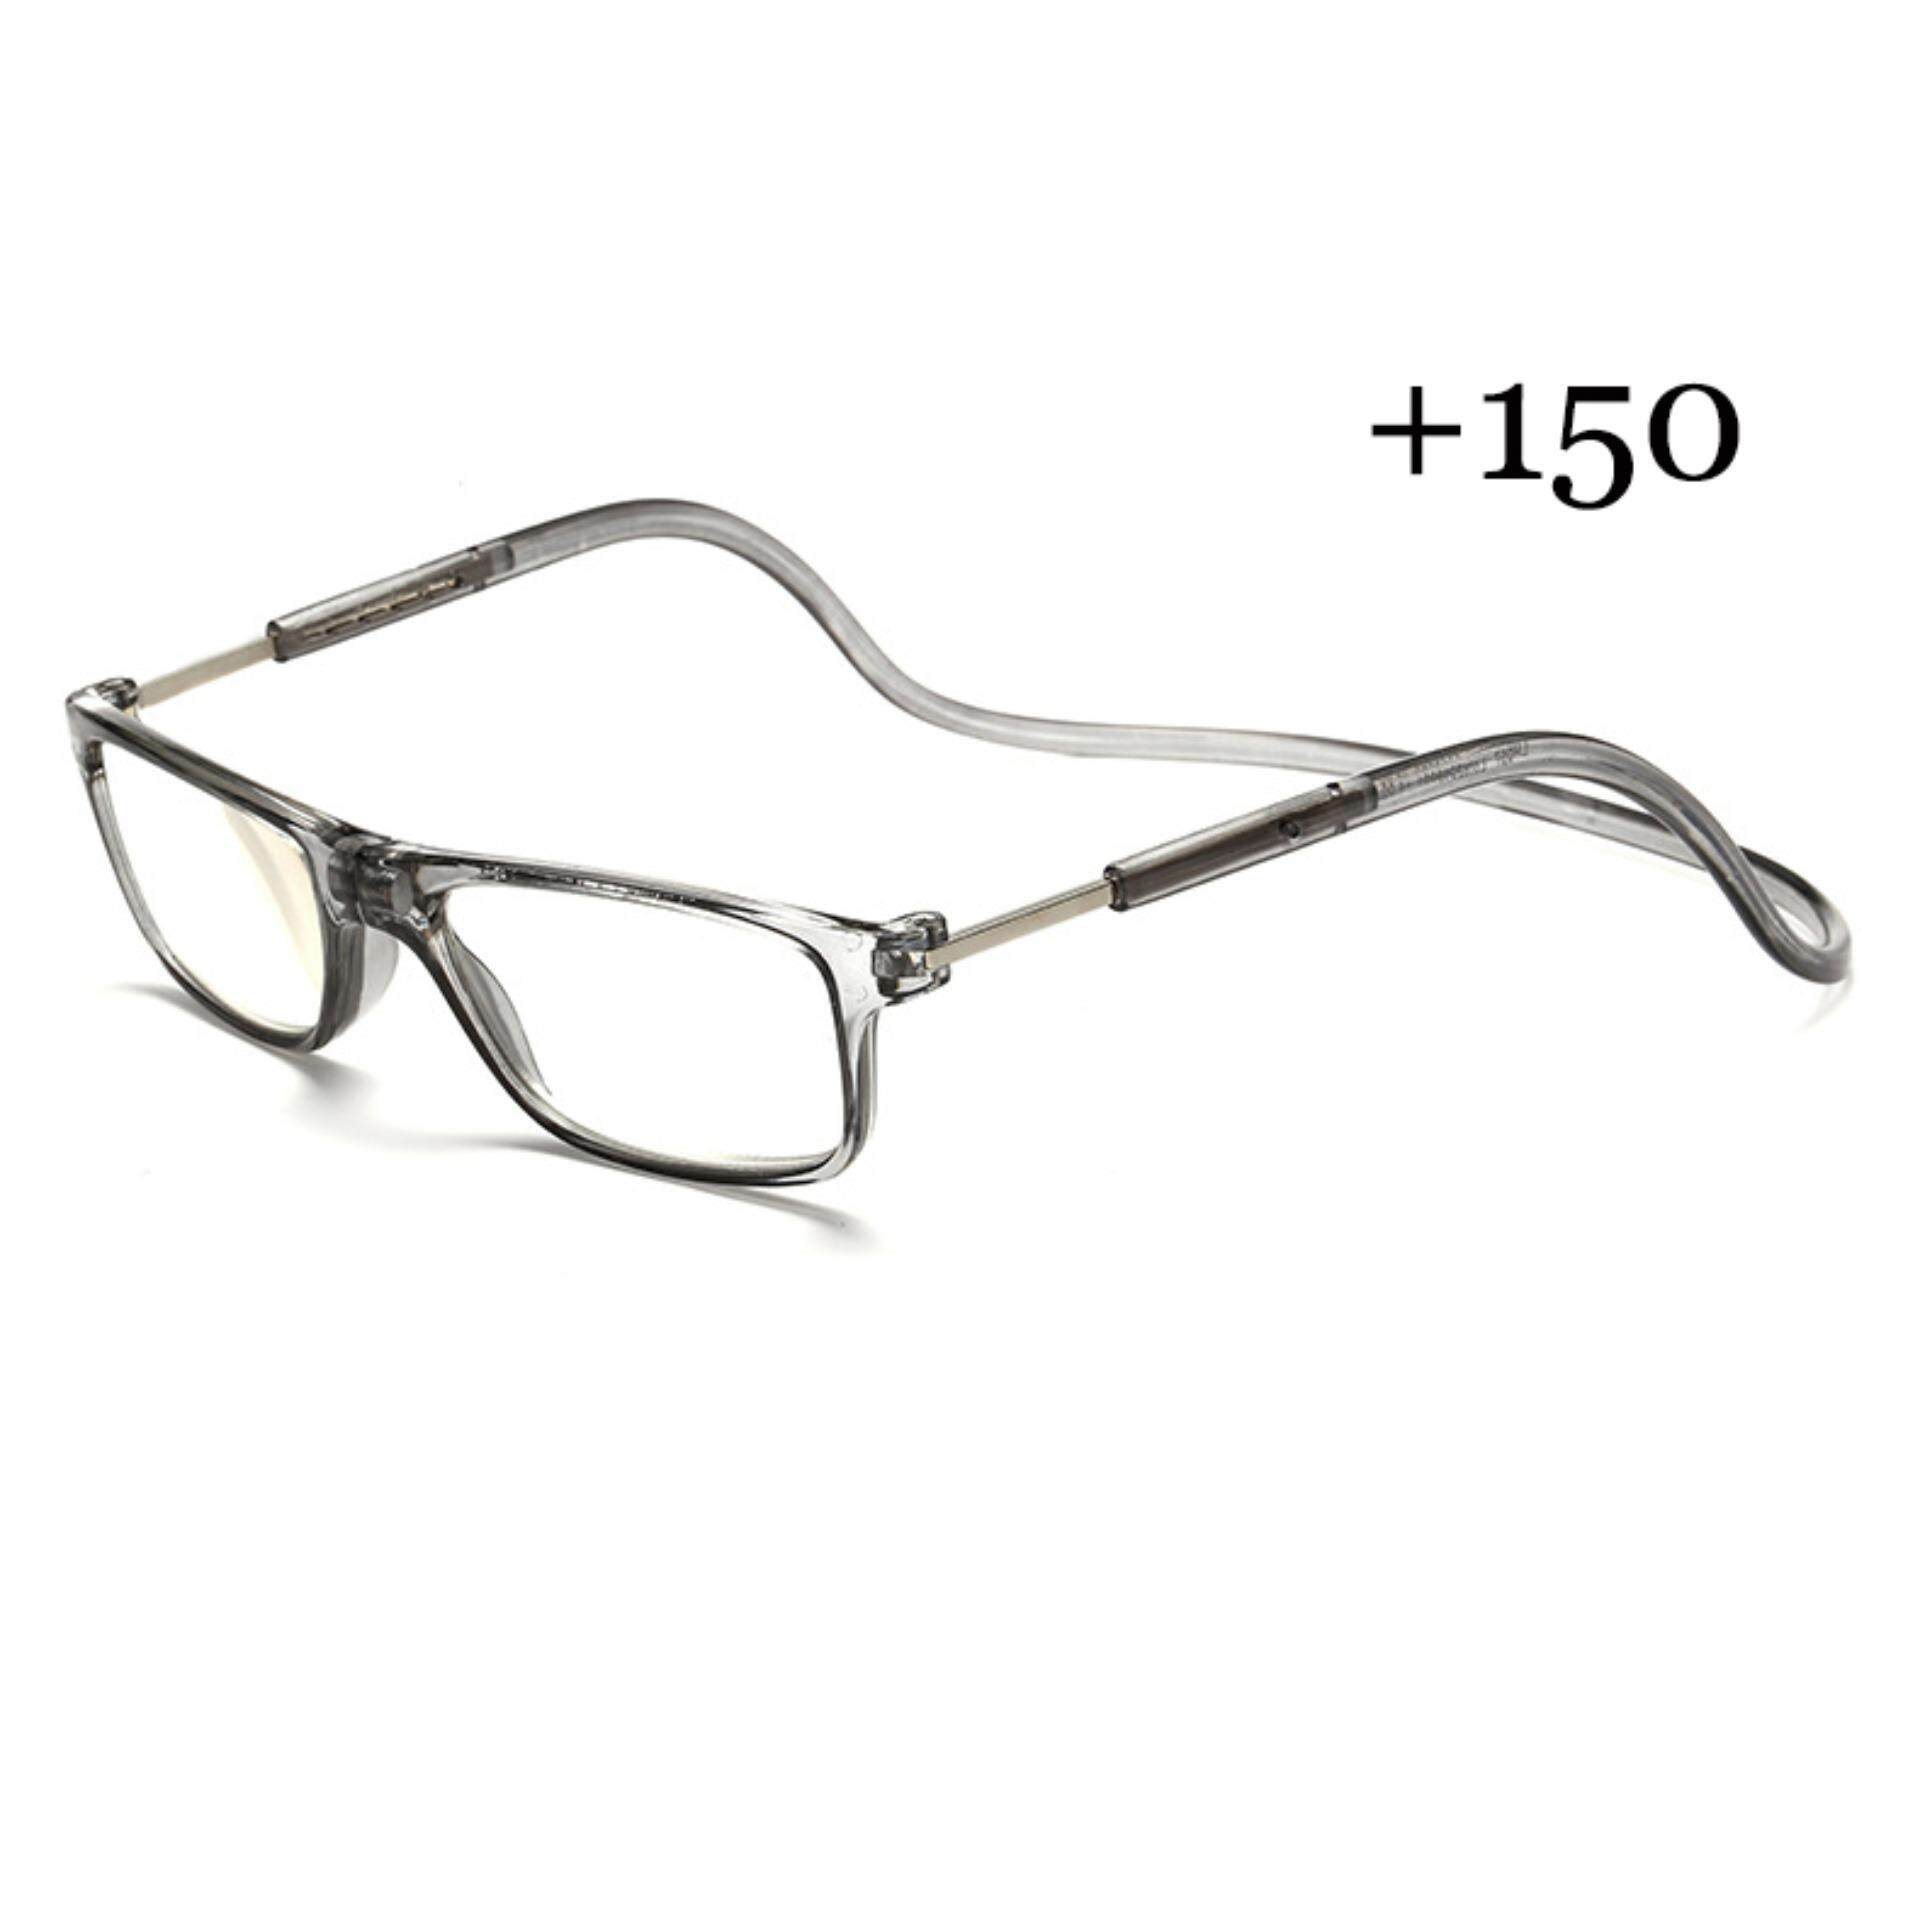 1caceb5a41 Magnetic Reading Glasses Click Adjustable Reading Eyeglasses Hanging Rim  Grey 150